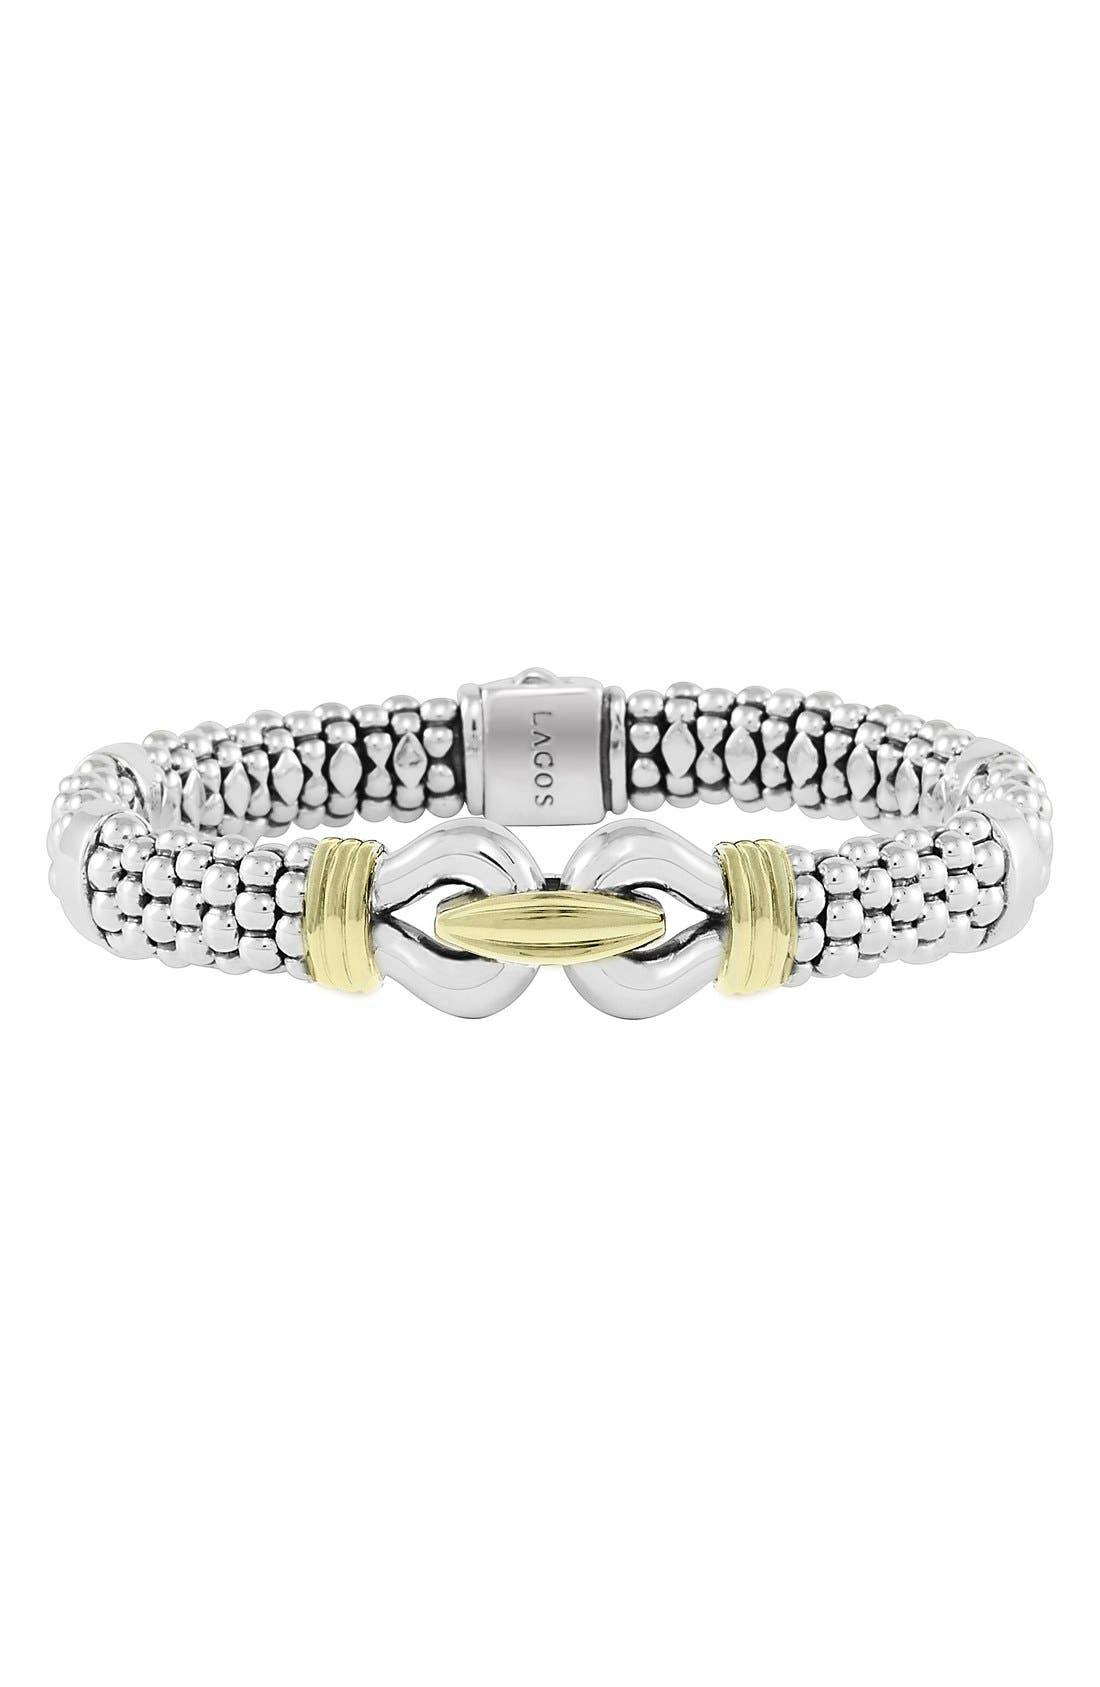 LAGOS Derby Two-Tone Caviar Rope Bracelet